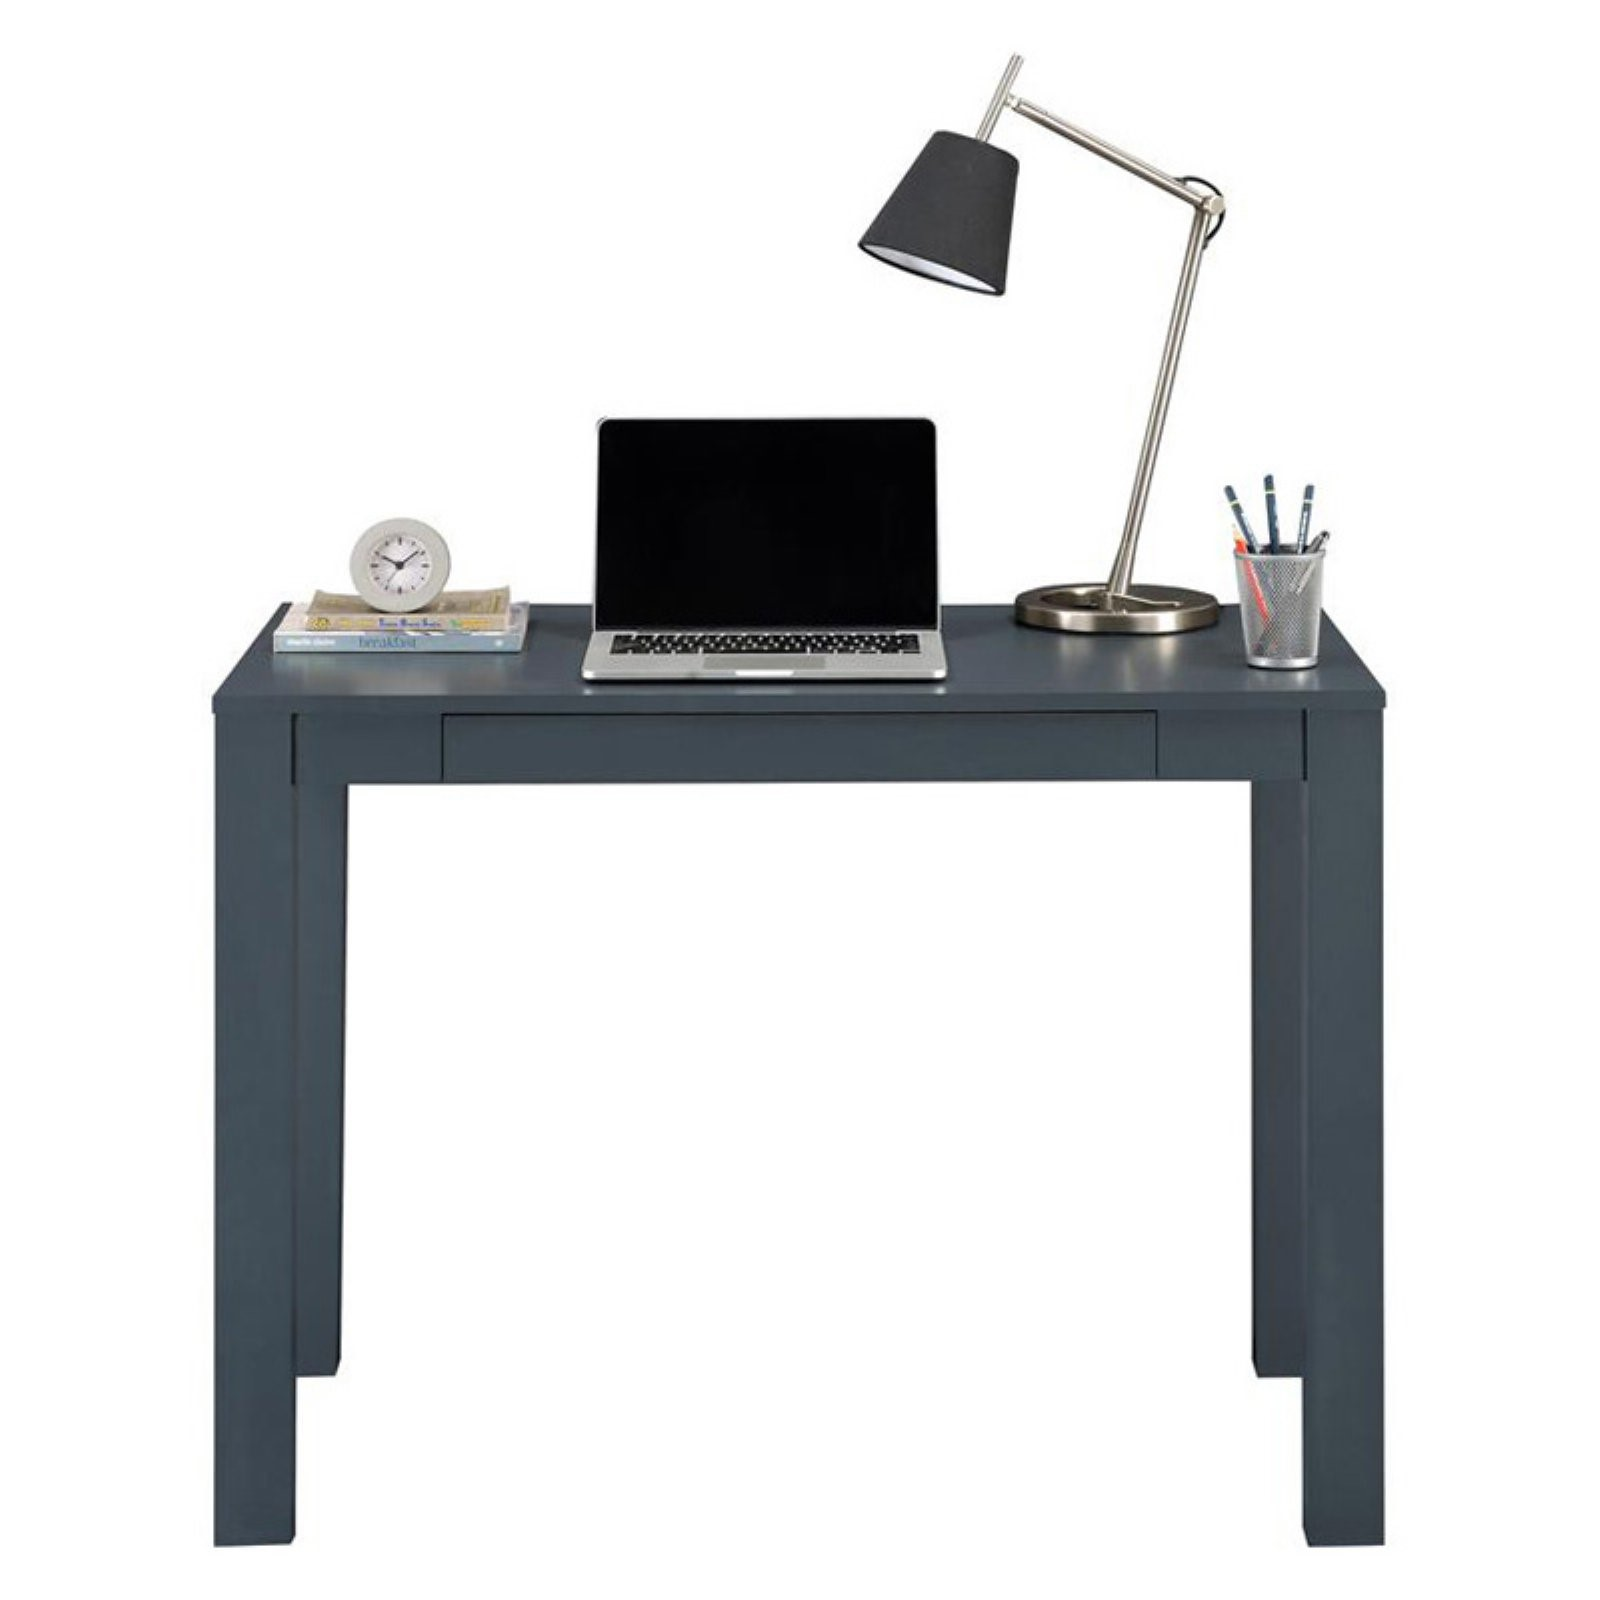 Altra Furniture Delilah Parsons Desk with Drawer